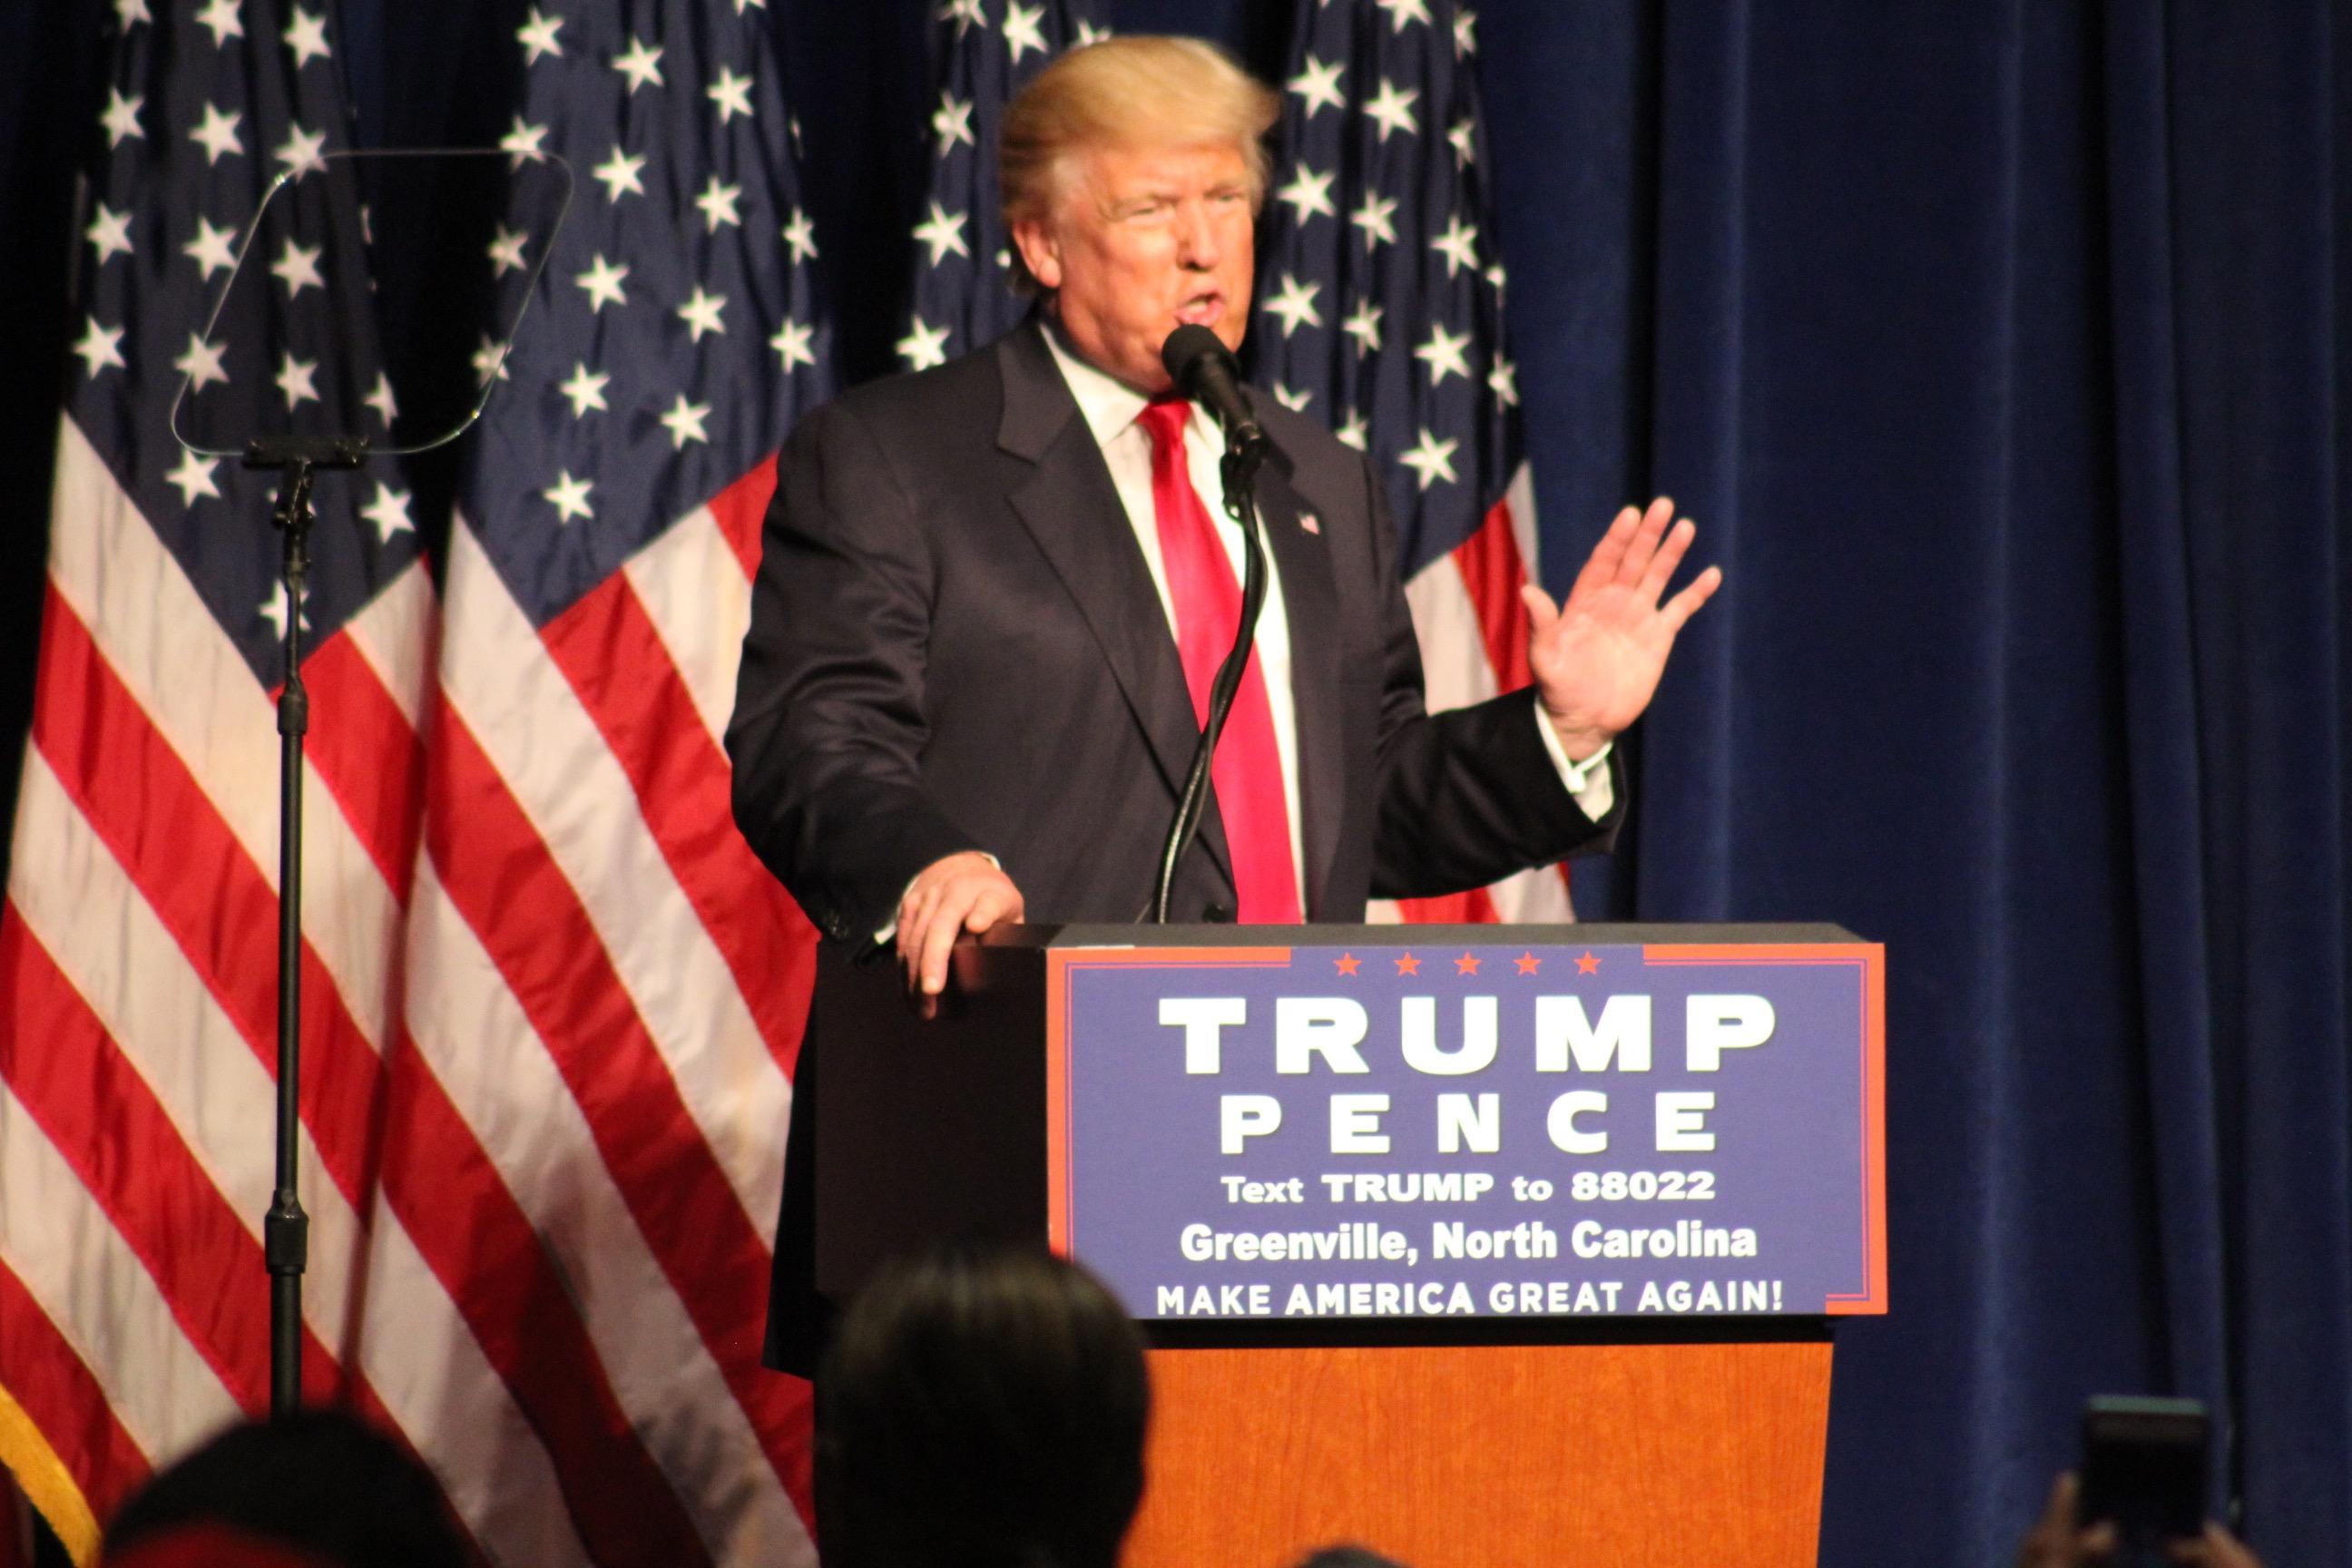 Trump in North Carolina yesterday